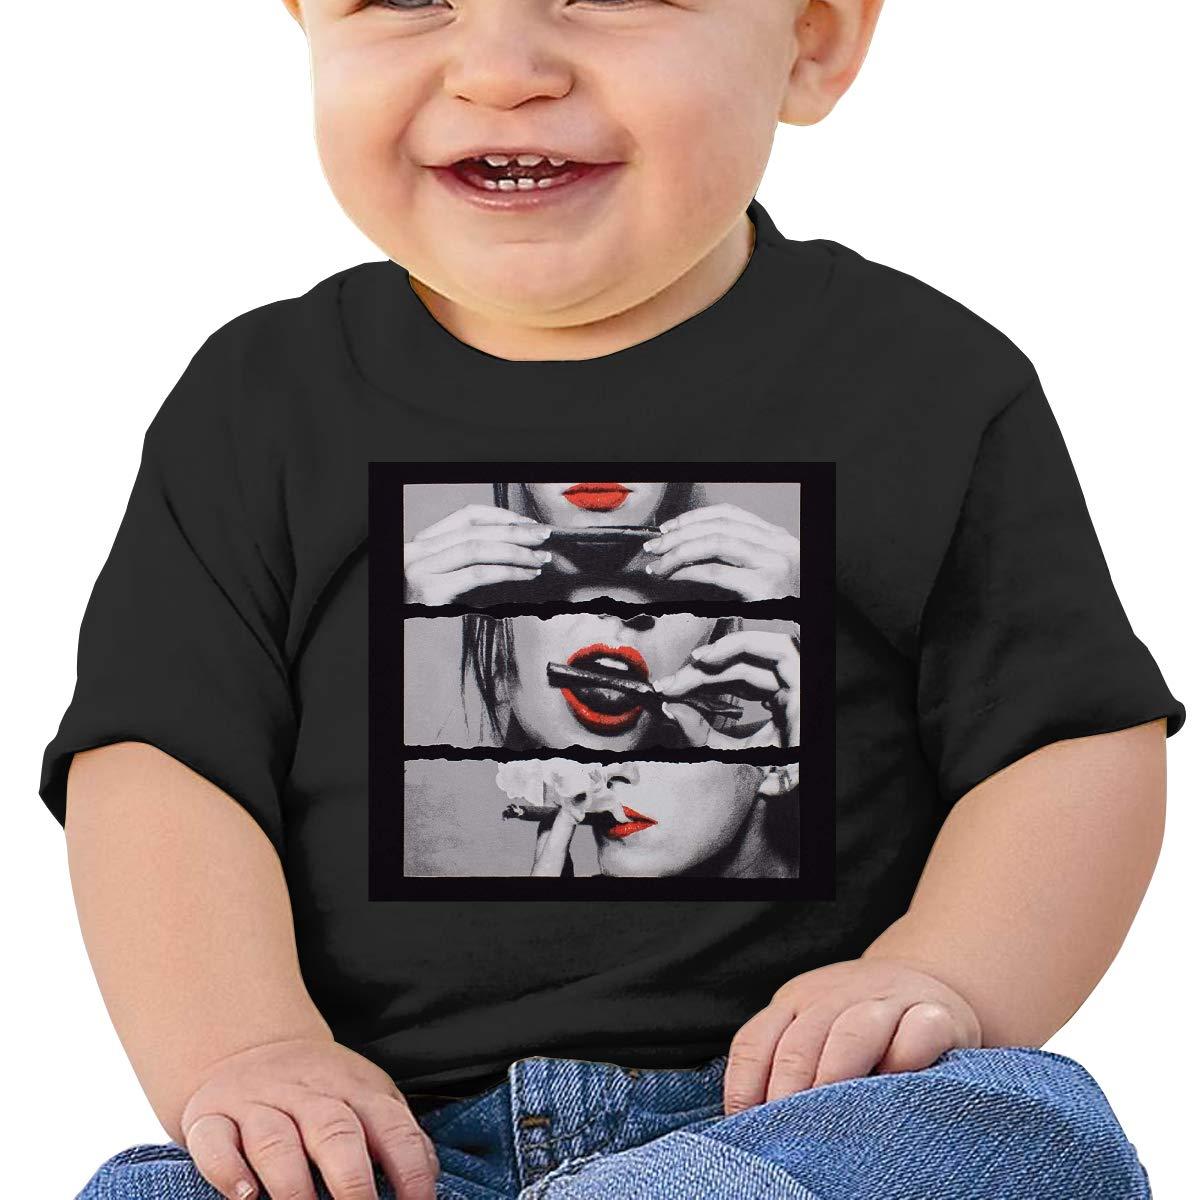 MONIKAL Unisex Infant Short Sleeve T-Shirt MainPhoto Toddler Kids Organic Cotton Graphic Tee Tops